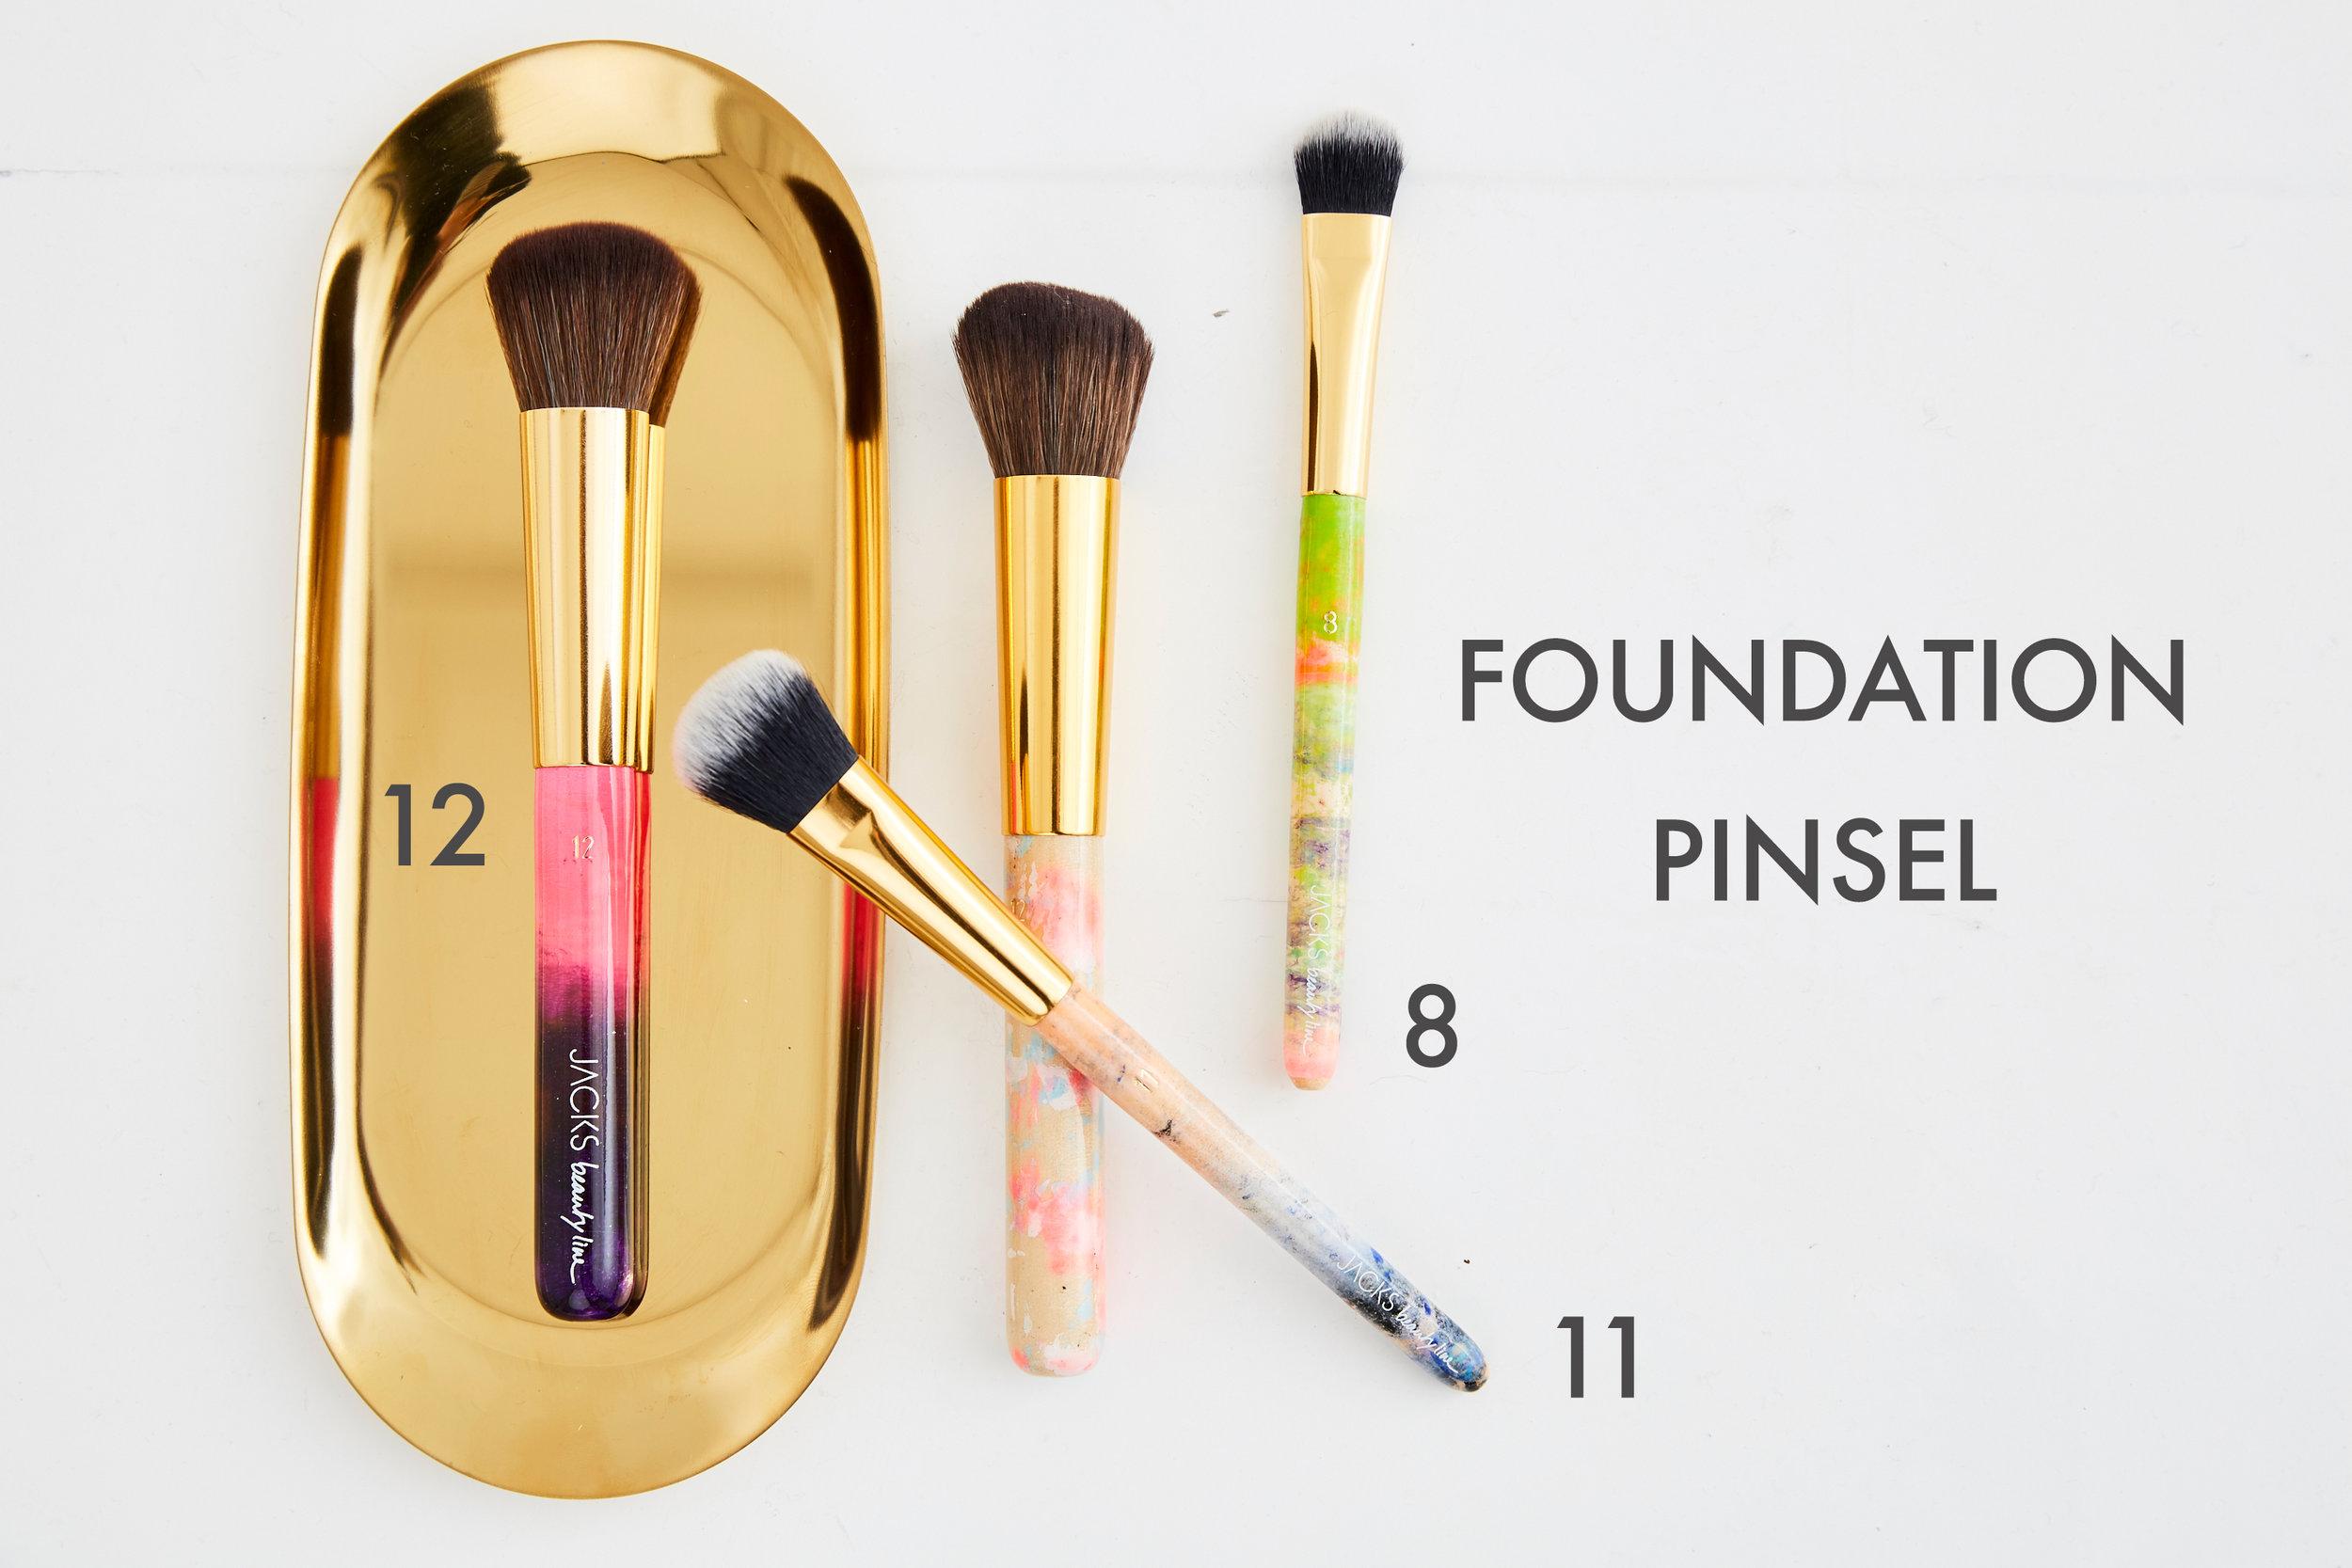 Pinsel_Foundation_Make-up_Jacksbeautyline.jpg